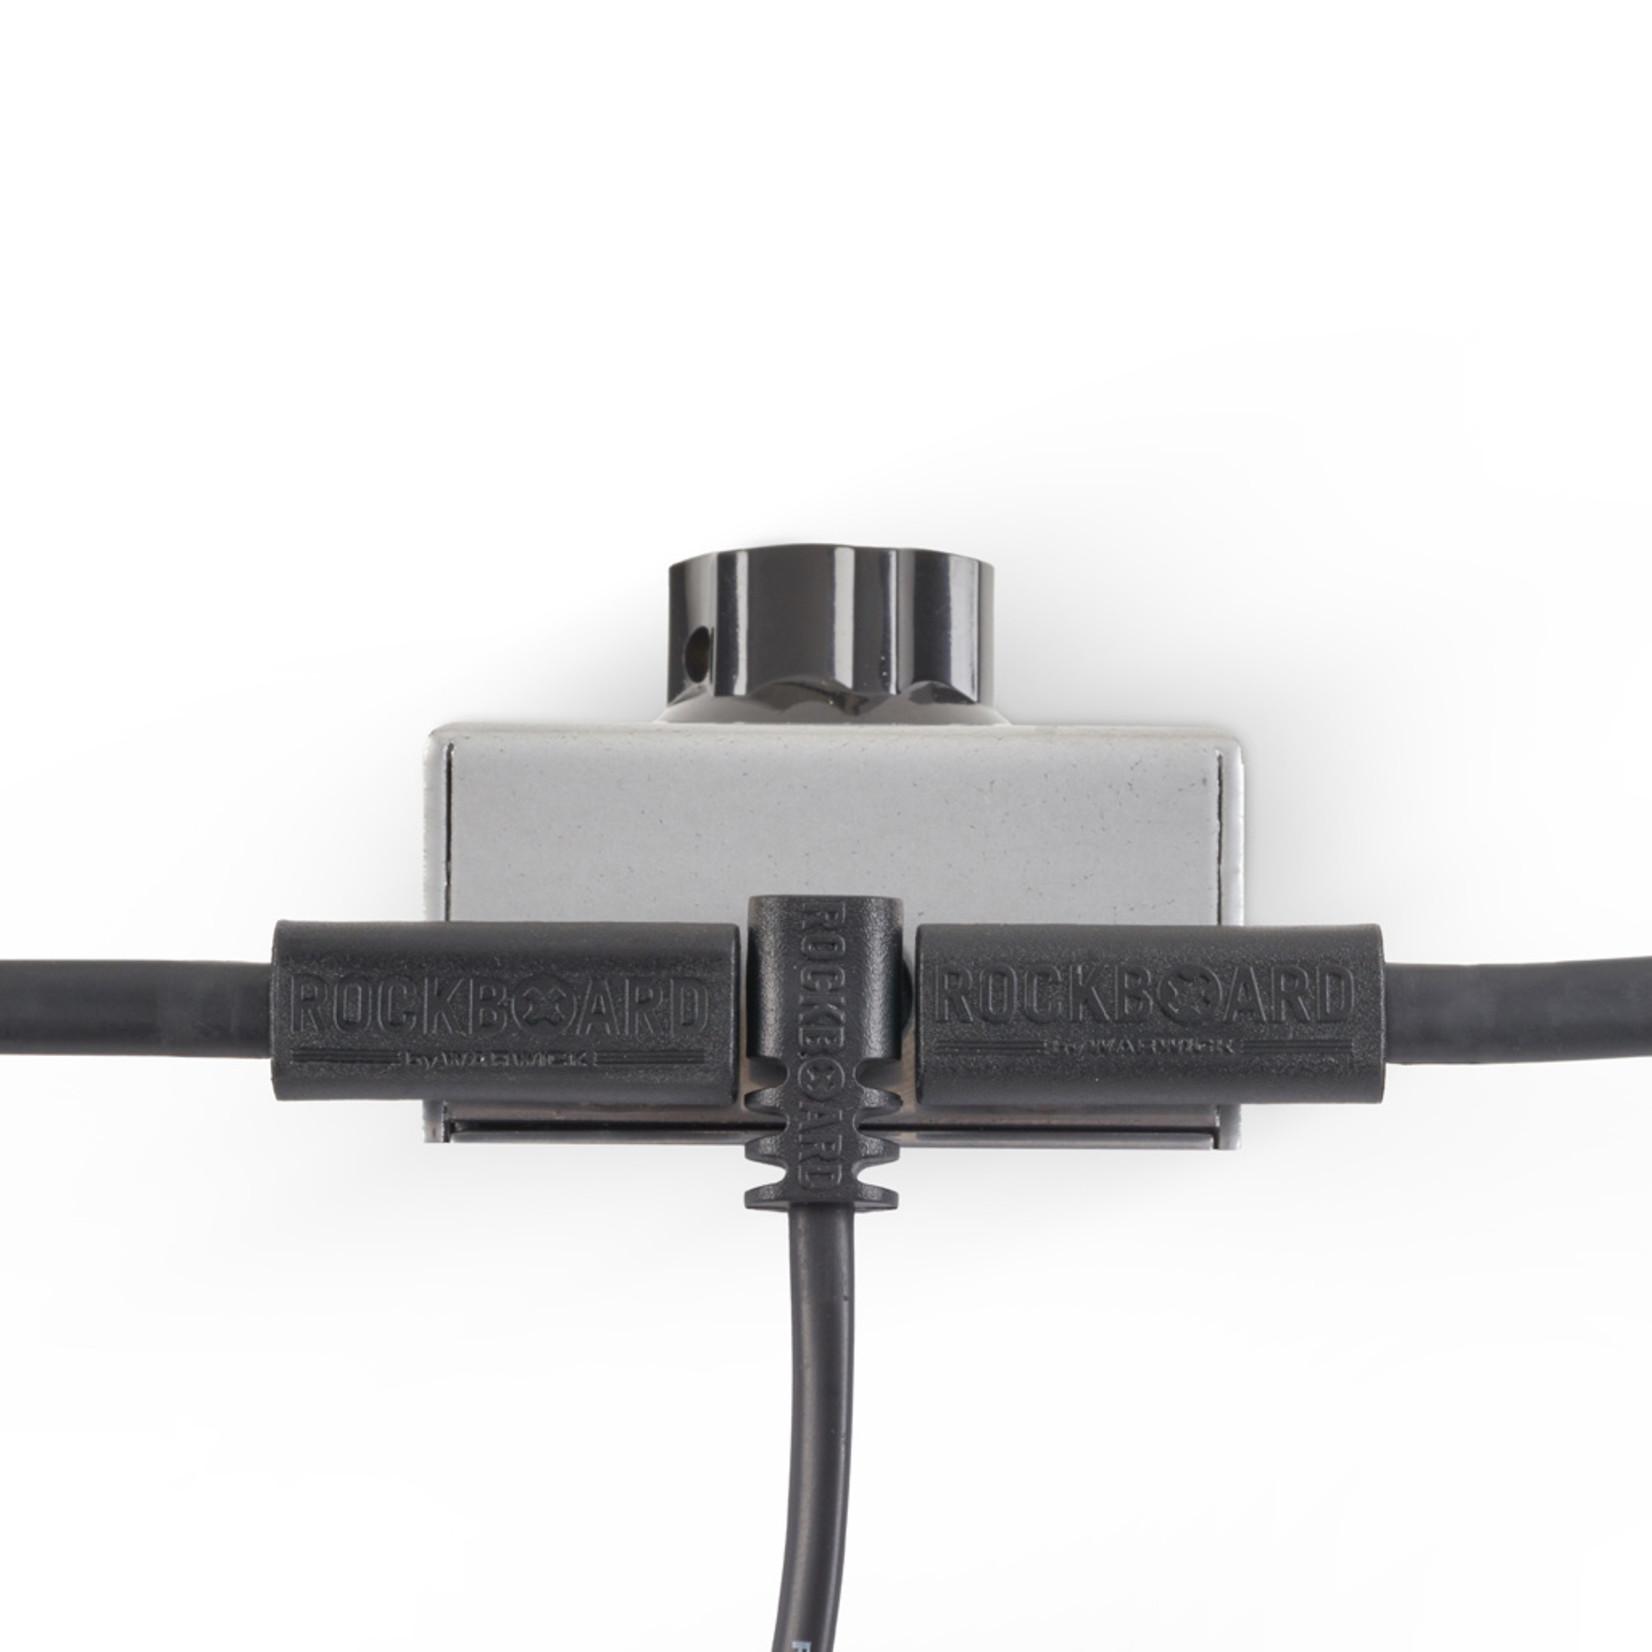 "Rockboard RockBoard Flat Power Cable - Angled/Angled - 60 cm / 23 5/8"""